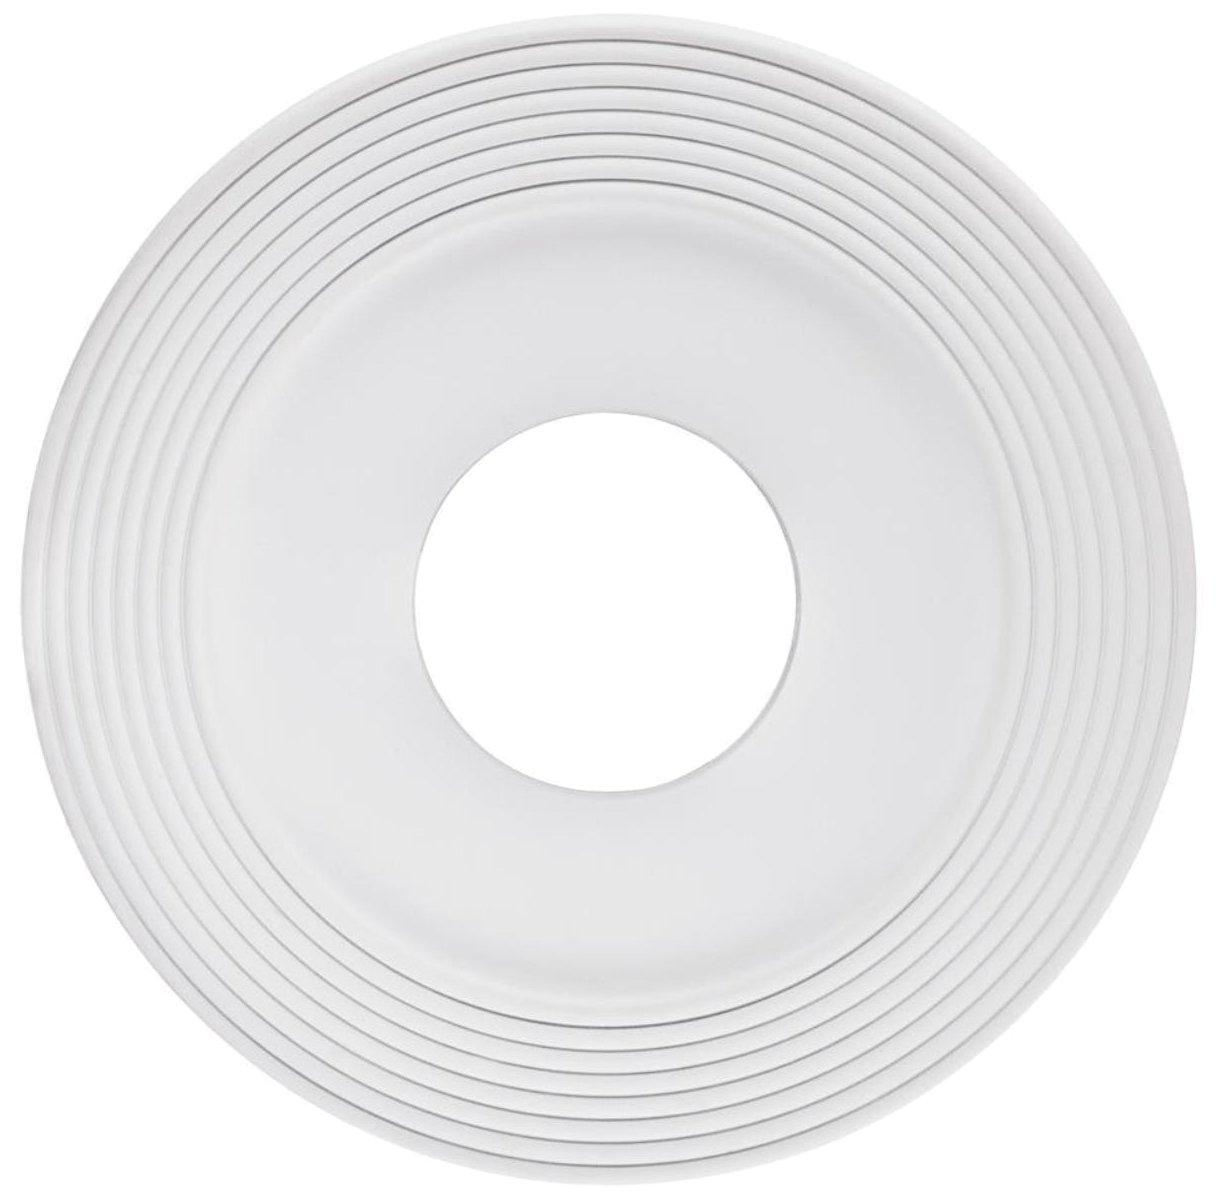 Westinghouse 7771200 12-Inch White Finish Saturn Ceiling Medallion